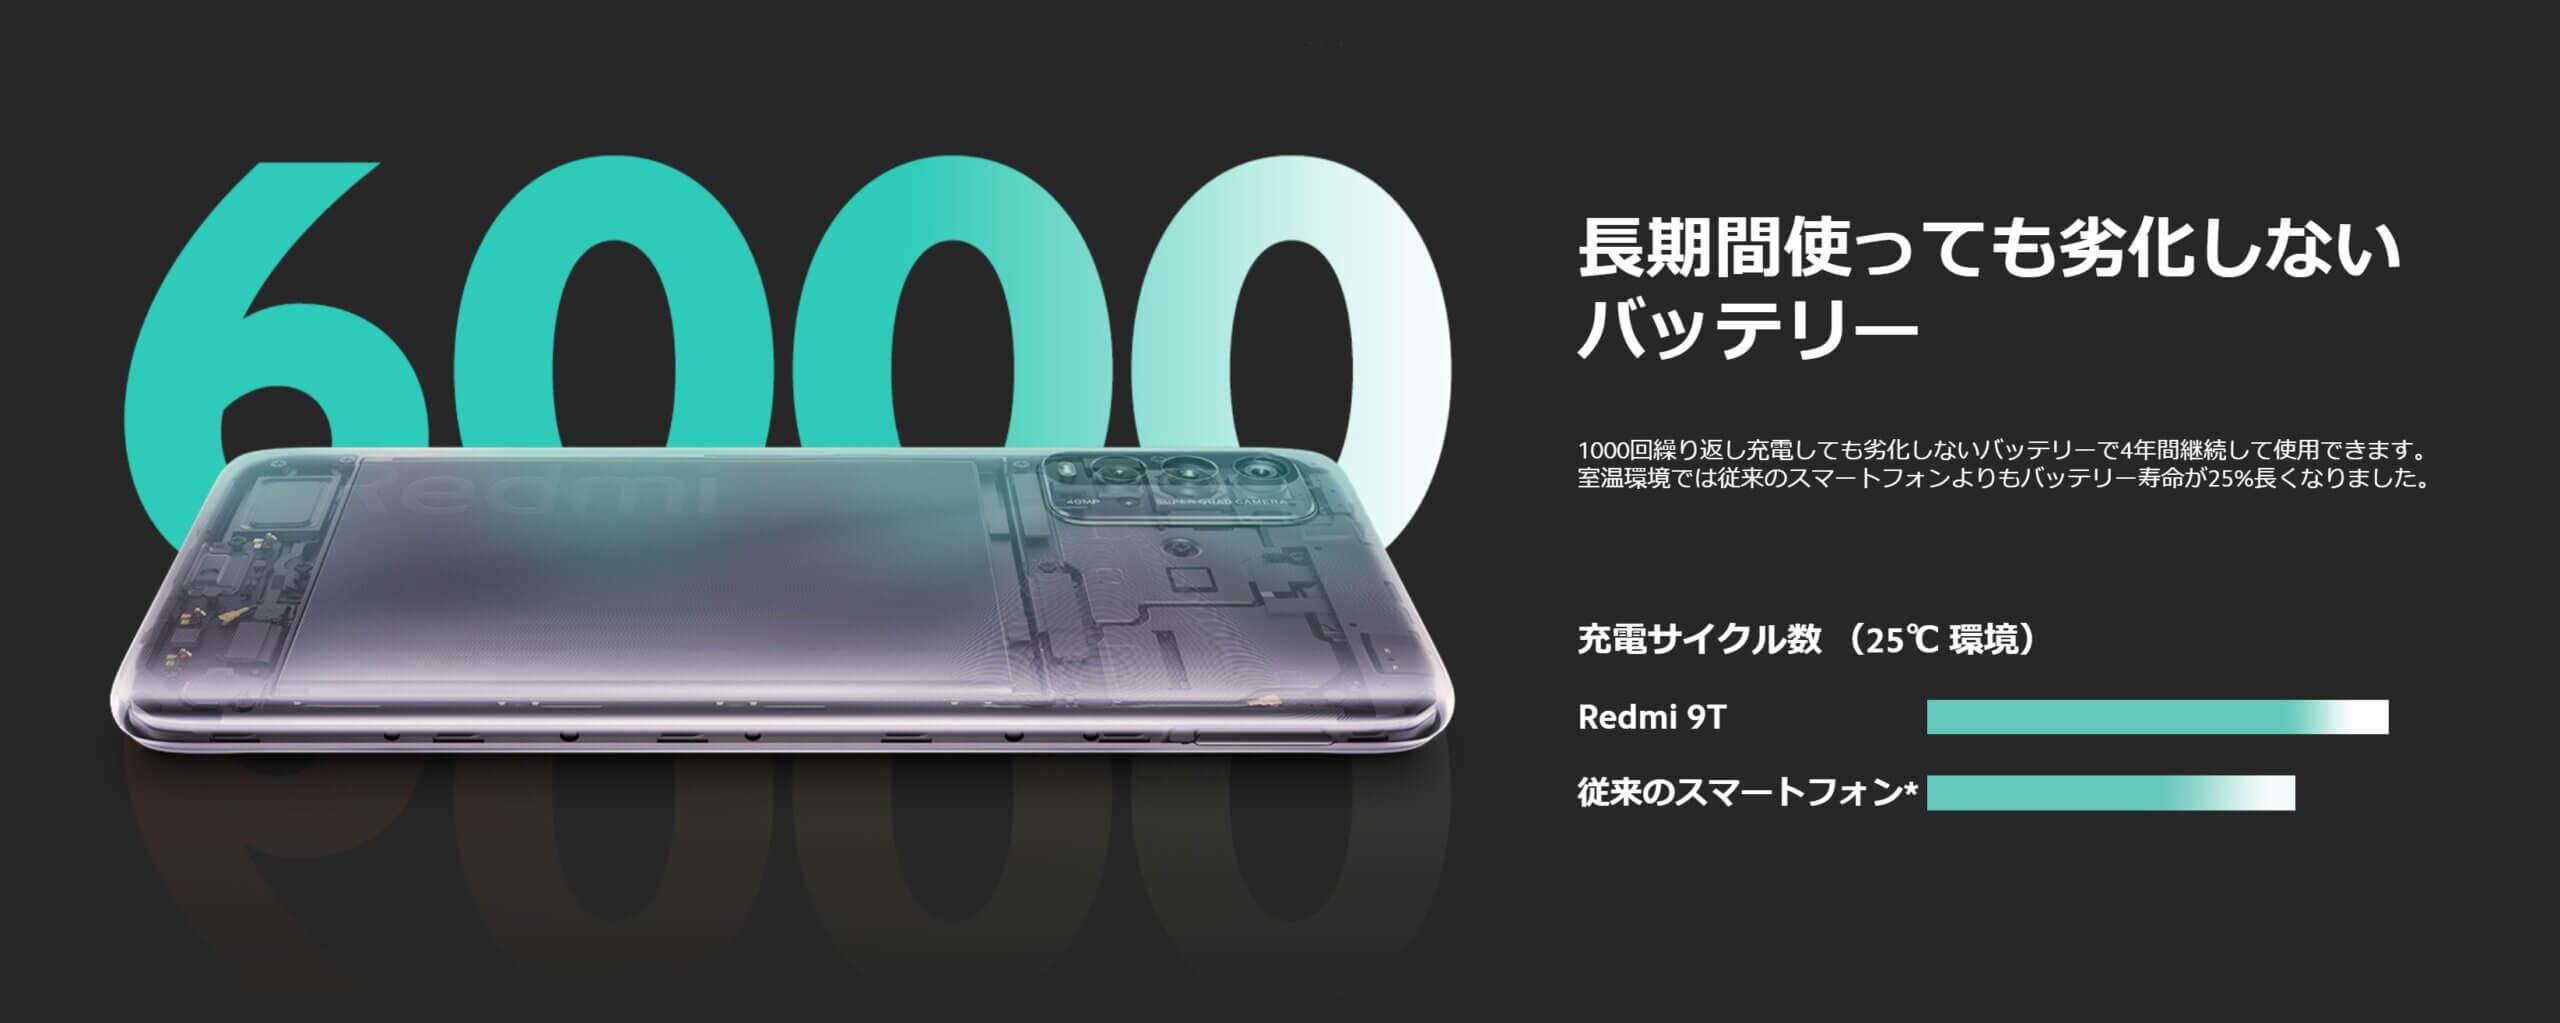 Xiaomi Redmi 9Tの電池は1000回充電しても劣化しない